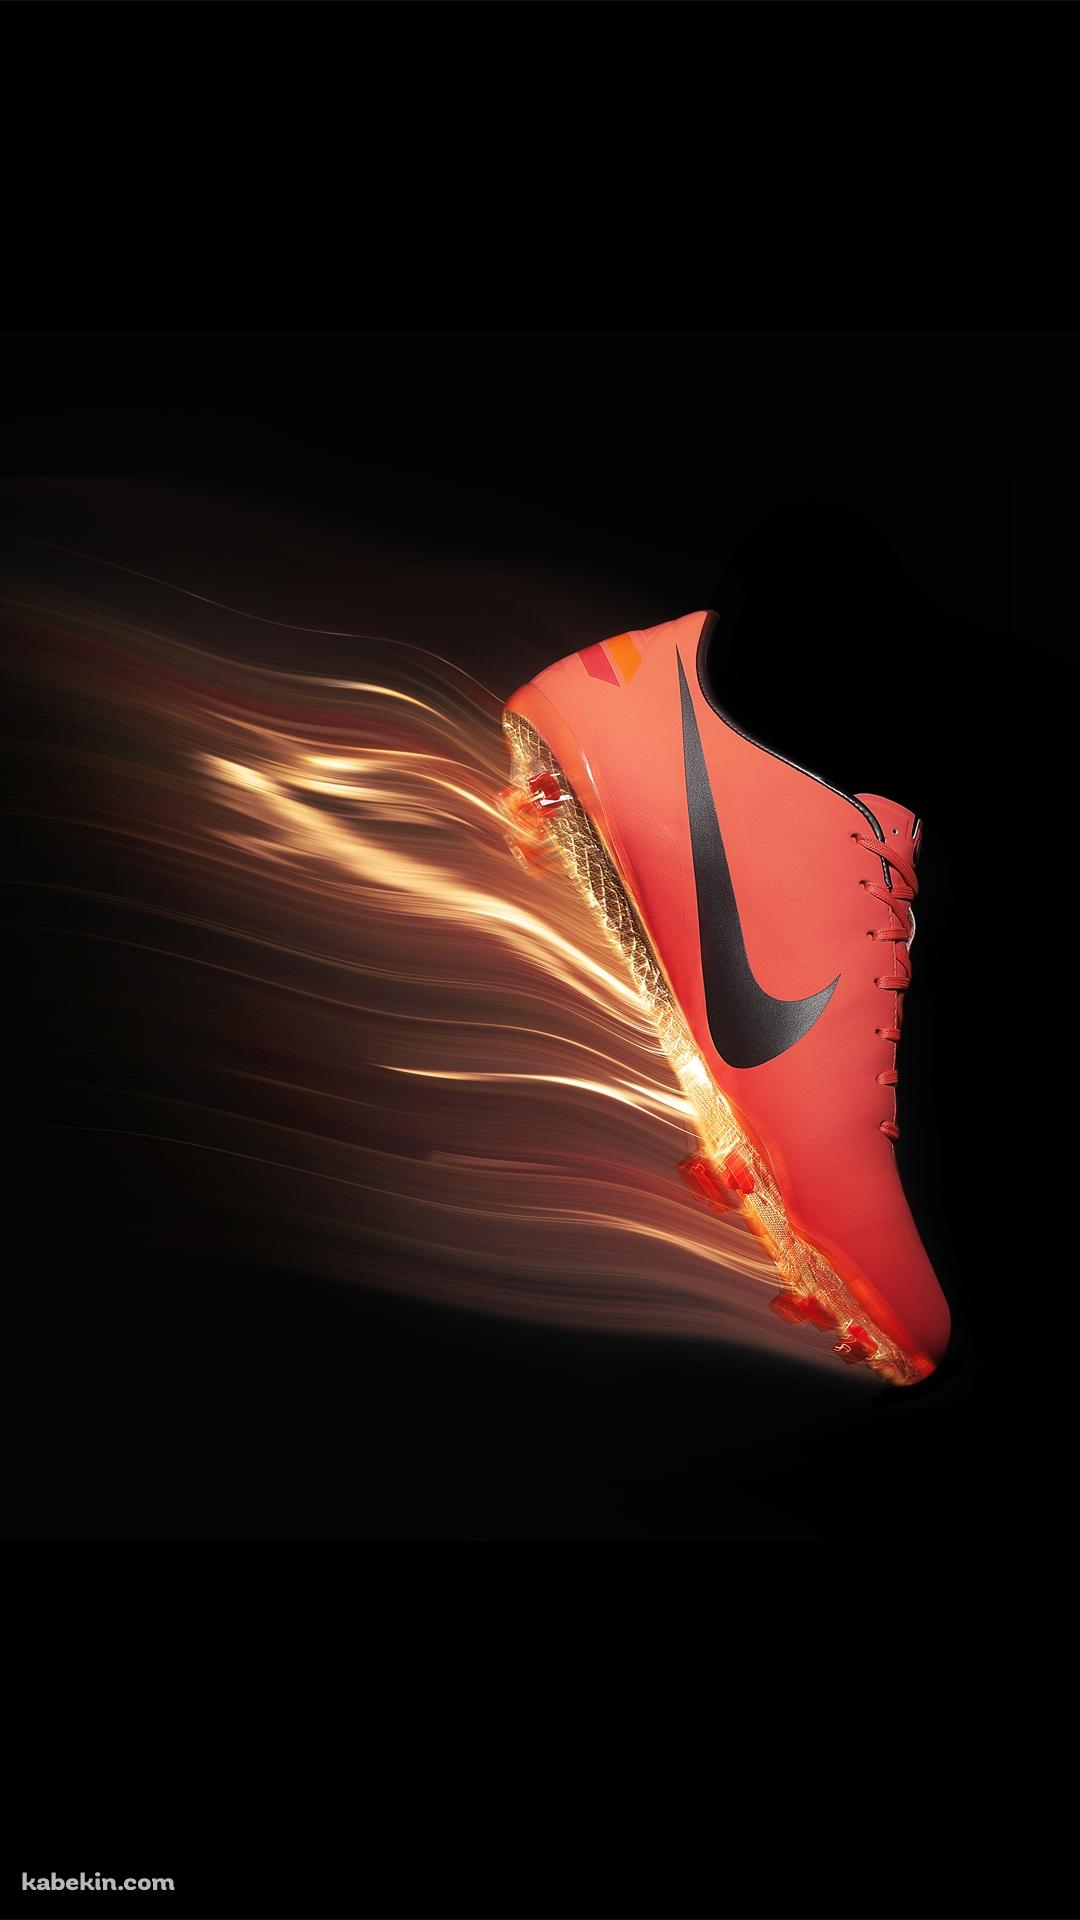 Nike サッカーシューズのandroid壁紙 1080 X 19 壁紙キングダム スマホ版